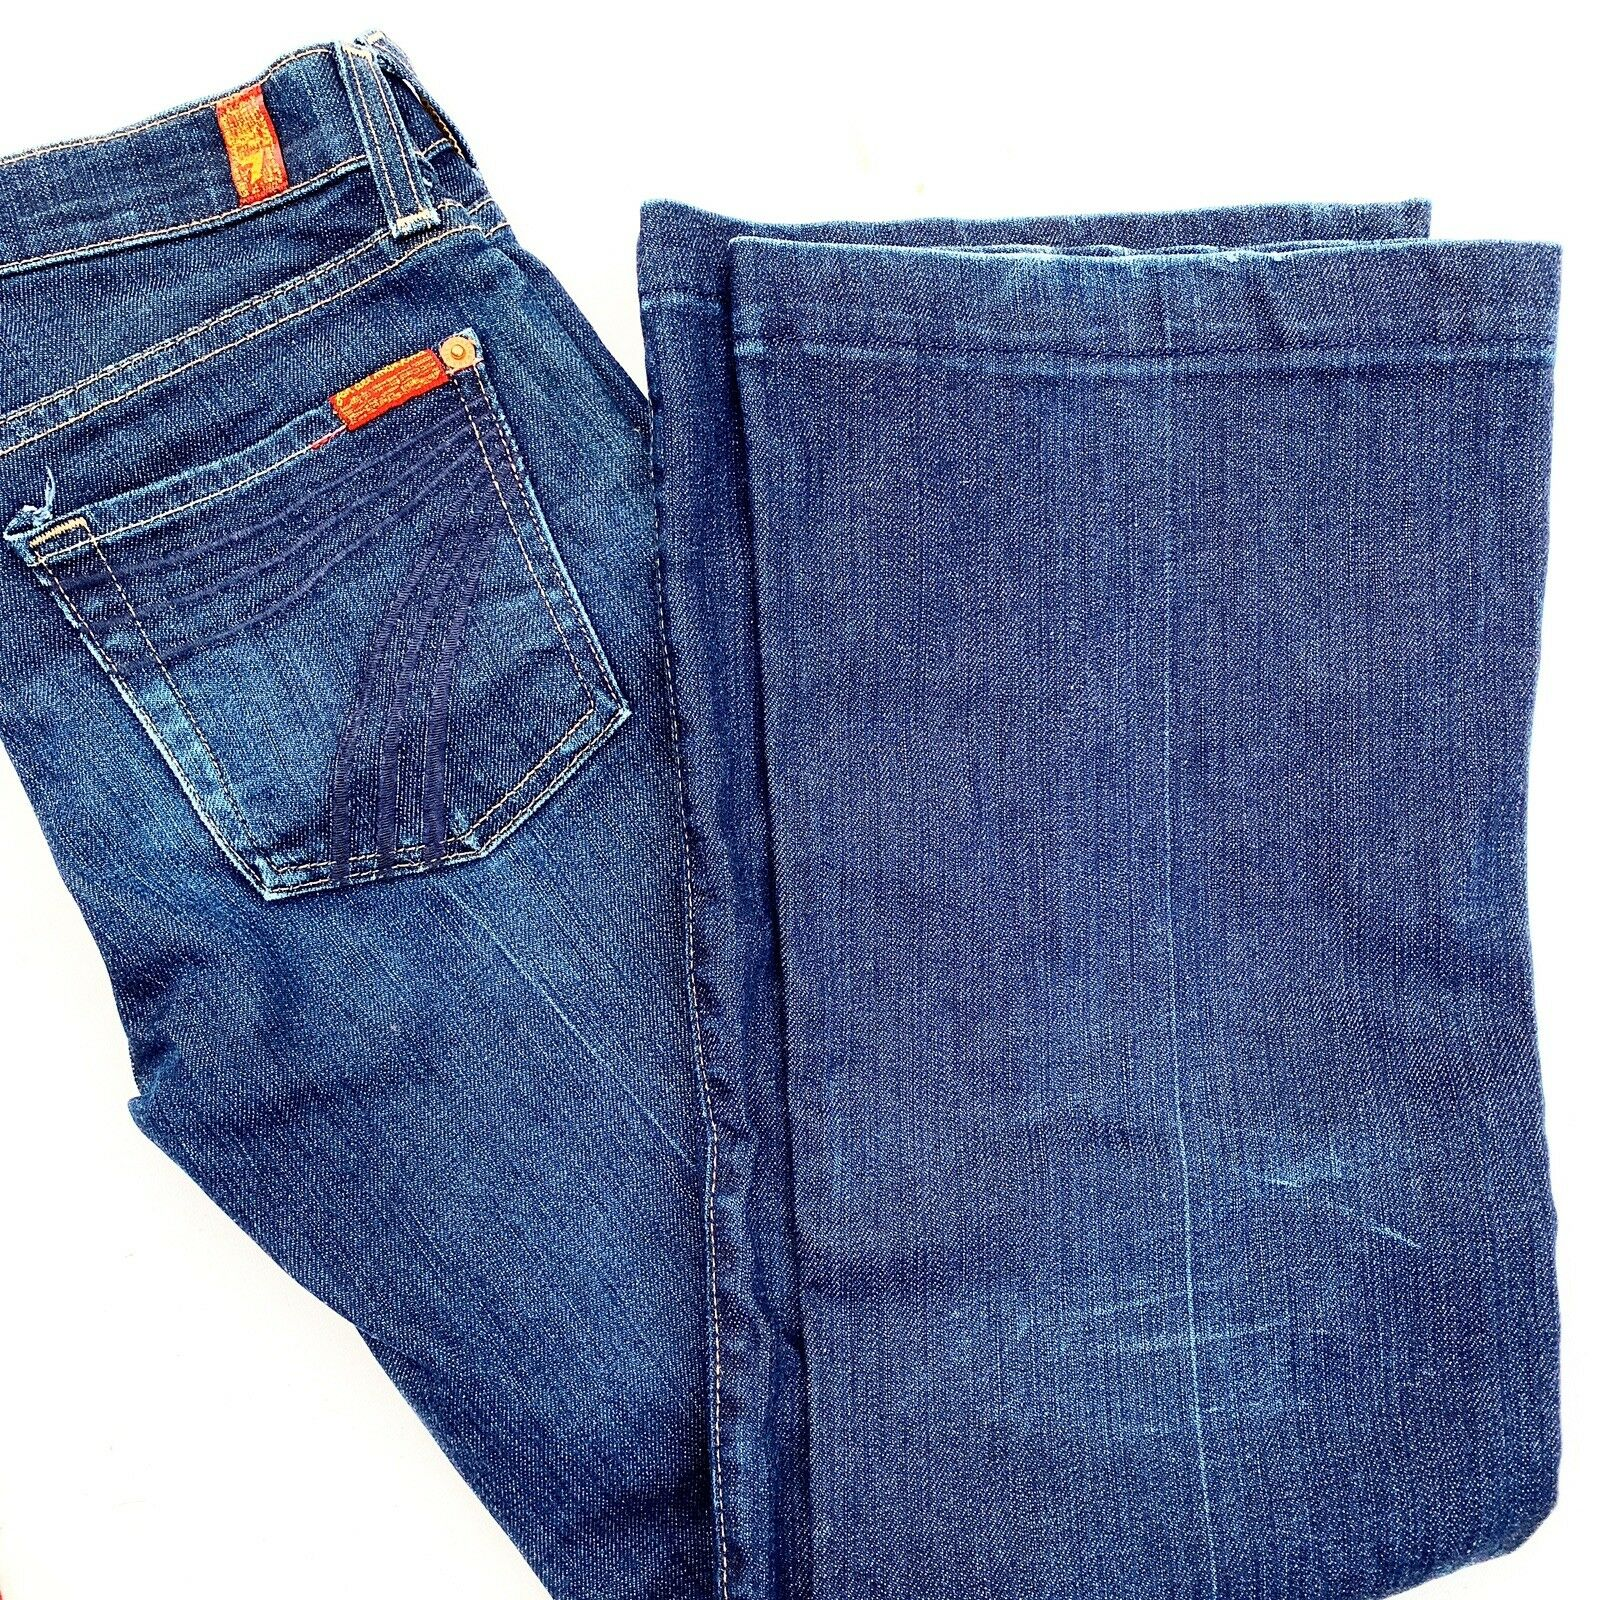 7 FOR ALL MAN KIND dojo jean flare contemporary 25